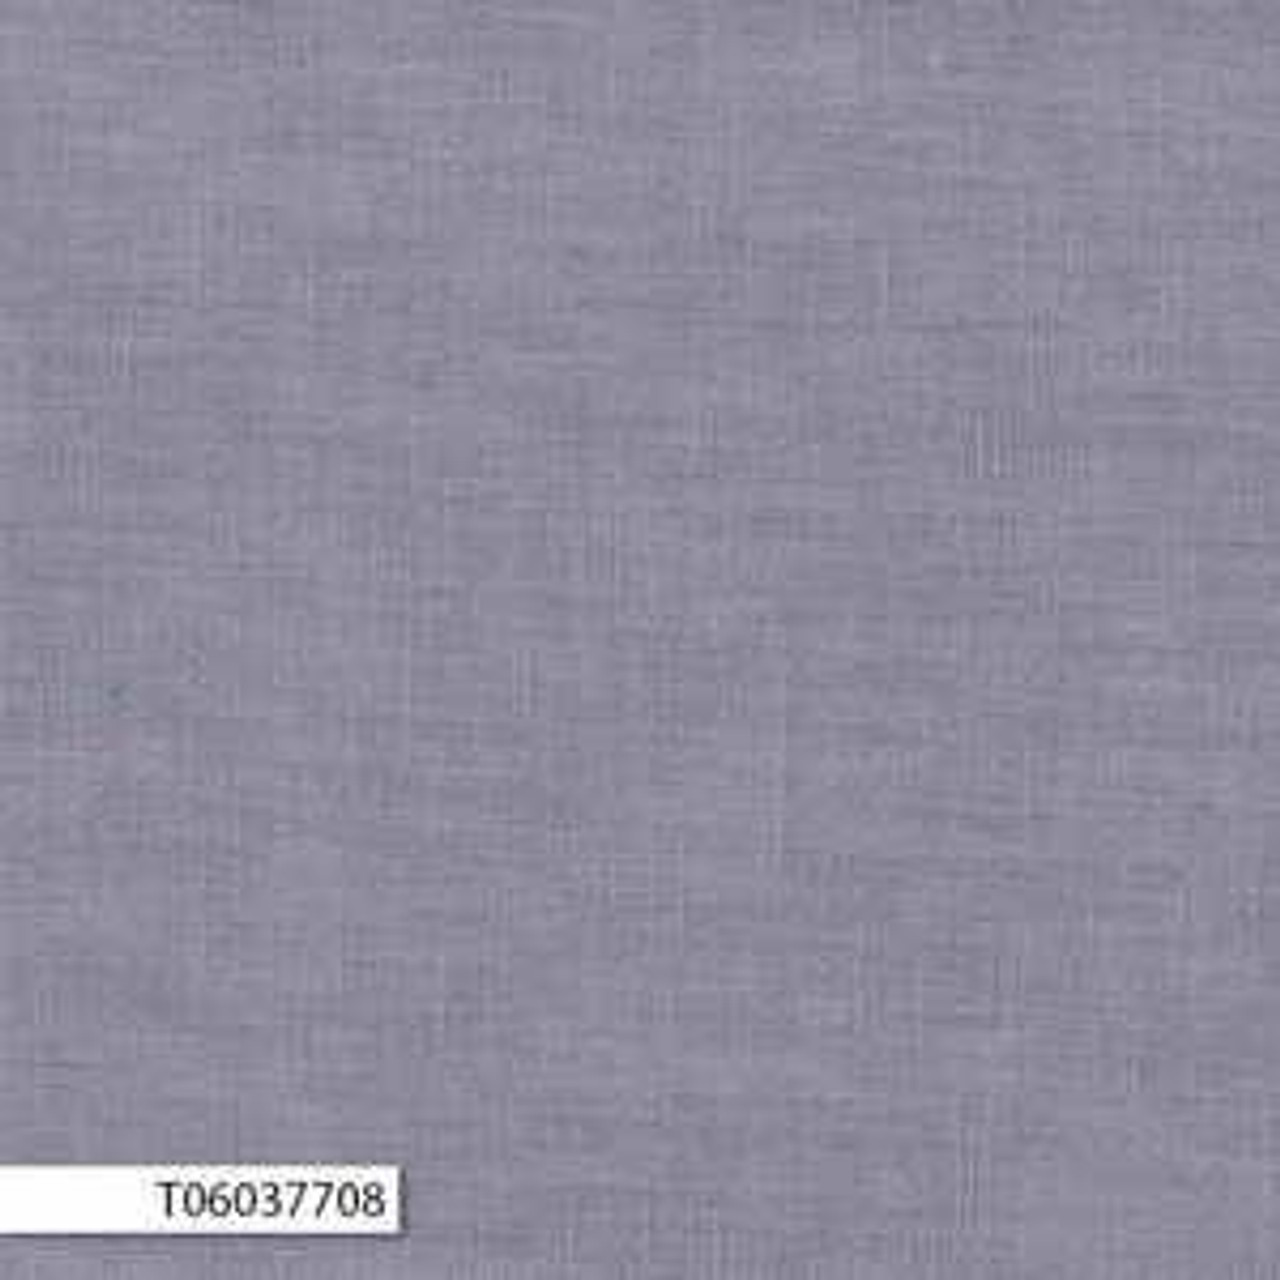 Hanky Linen: Silver